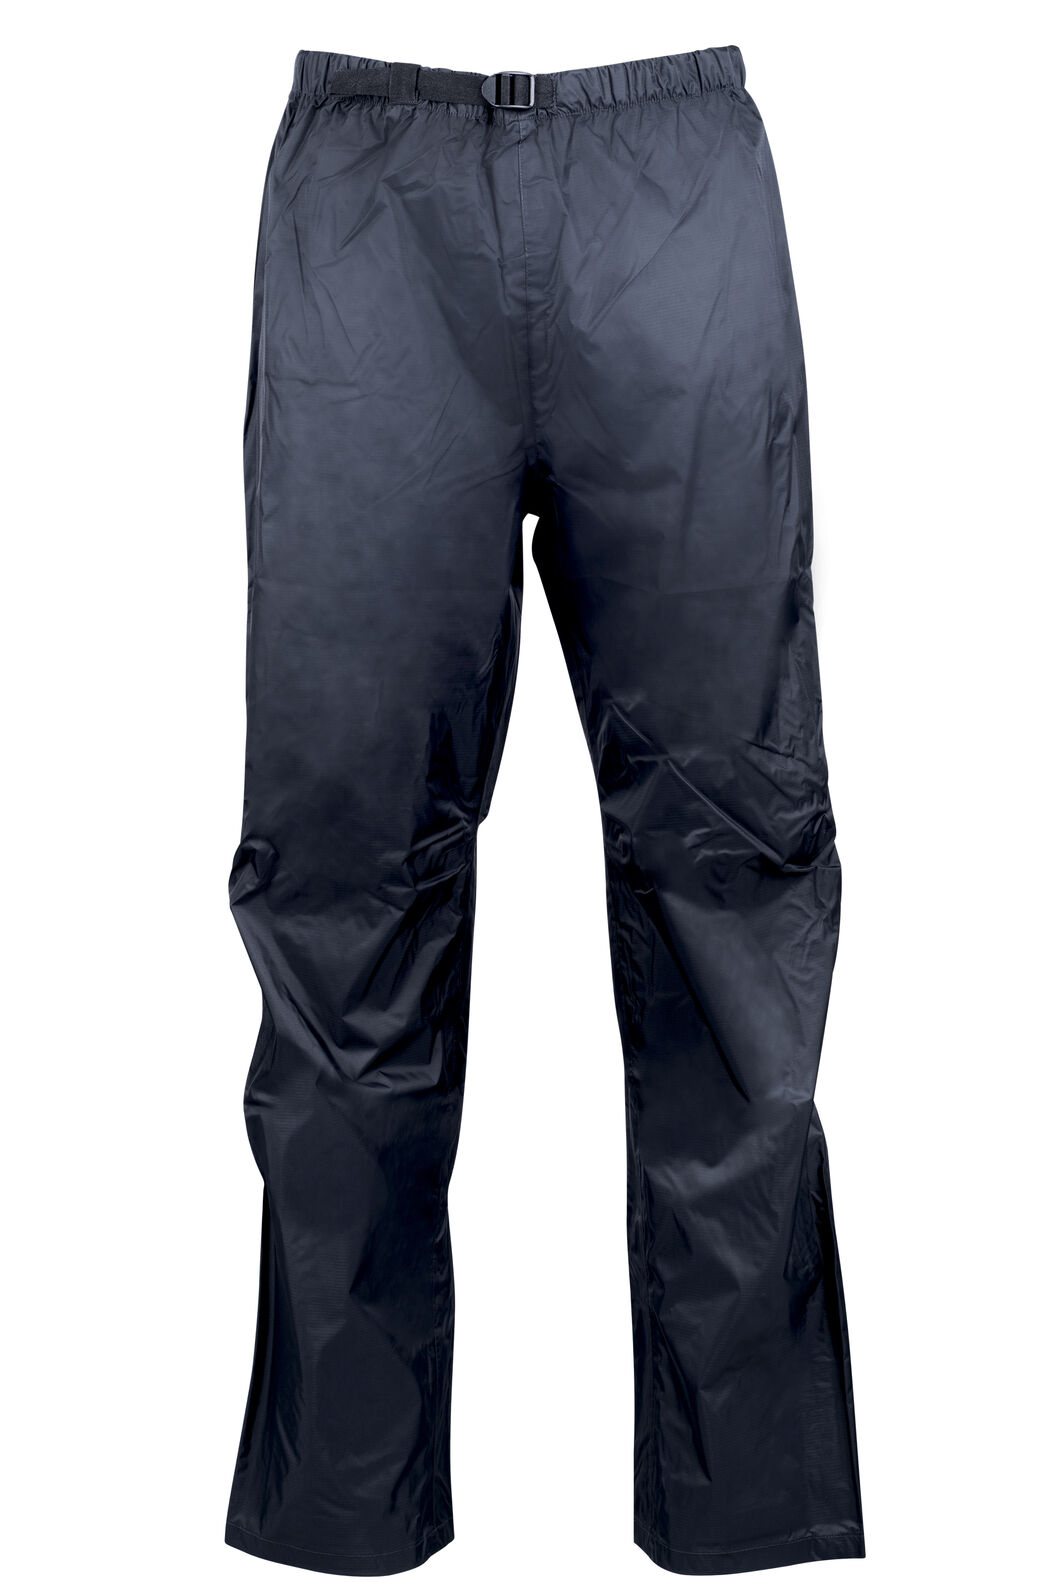 Macpac Jetstream Rain Pants - Men's, Black, hi-res